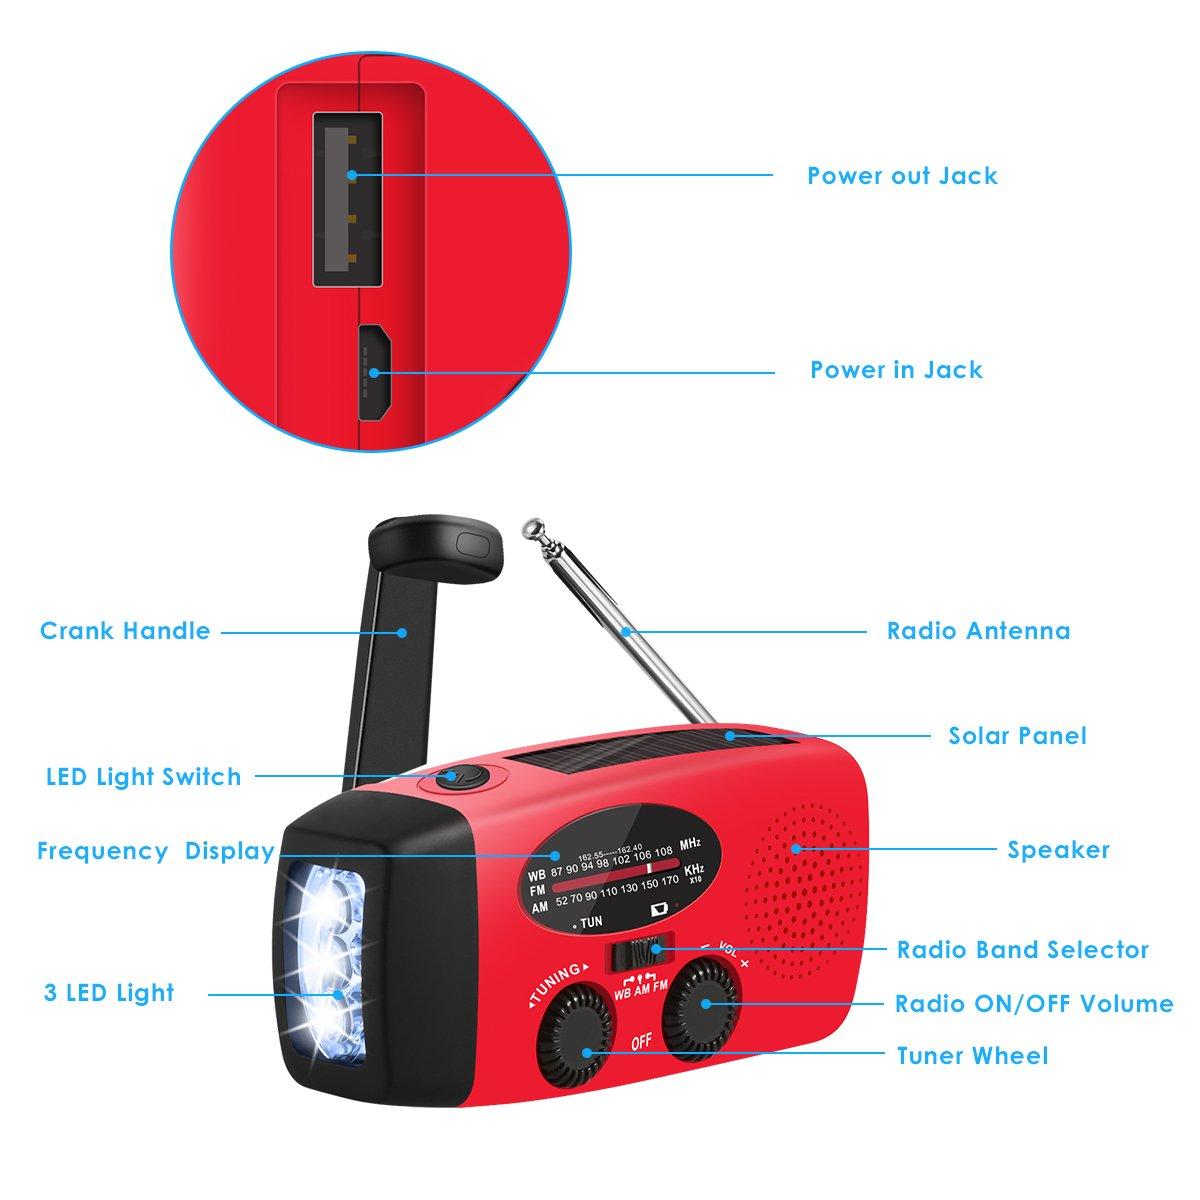 Wallfire Notfall Wetter Radio Tragbares Notfall Solar Radio Hand Kurbel Selbst Powered Handy Ladeger/ät 3-LED Taschenlampe am FM